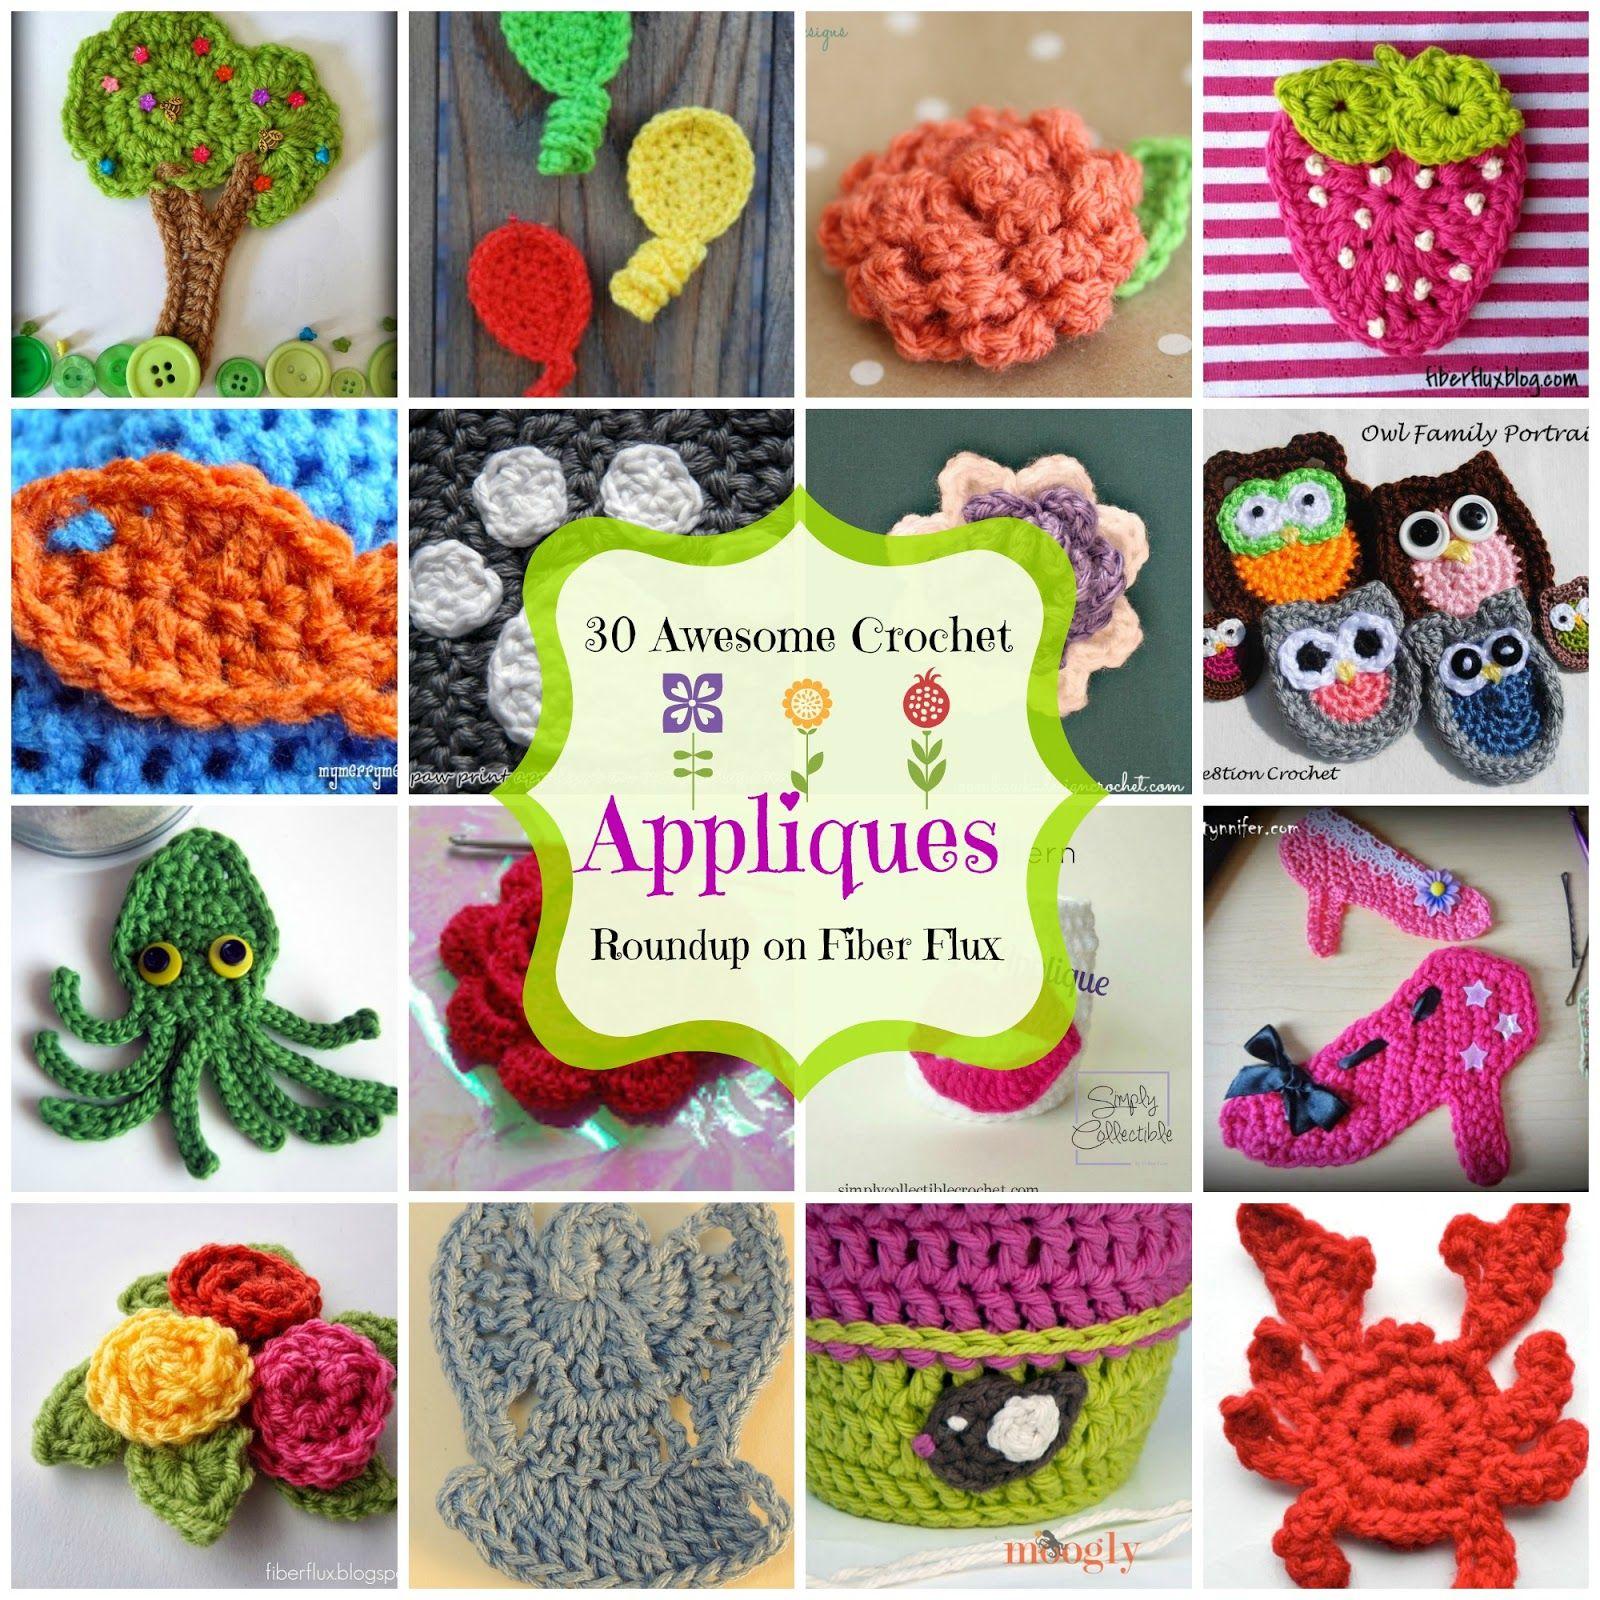 30 Awesome Appliques! A Crochet Applique Roundup